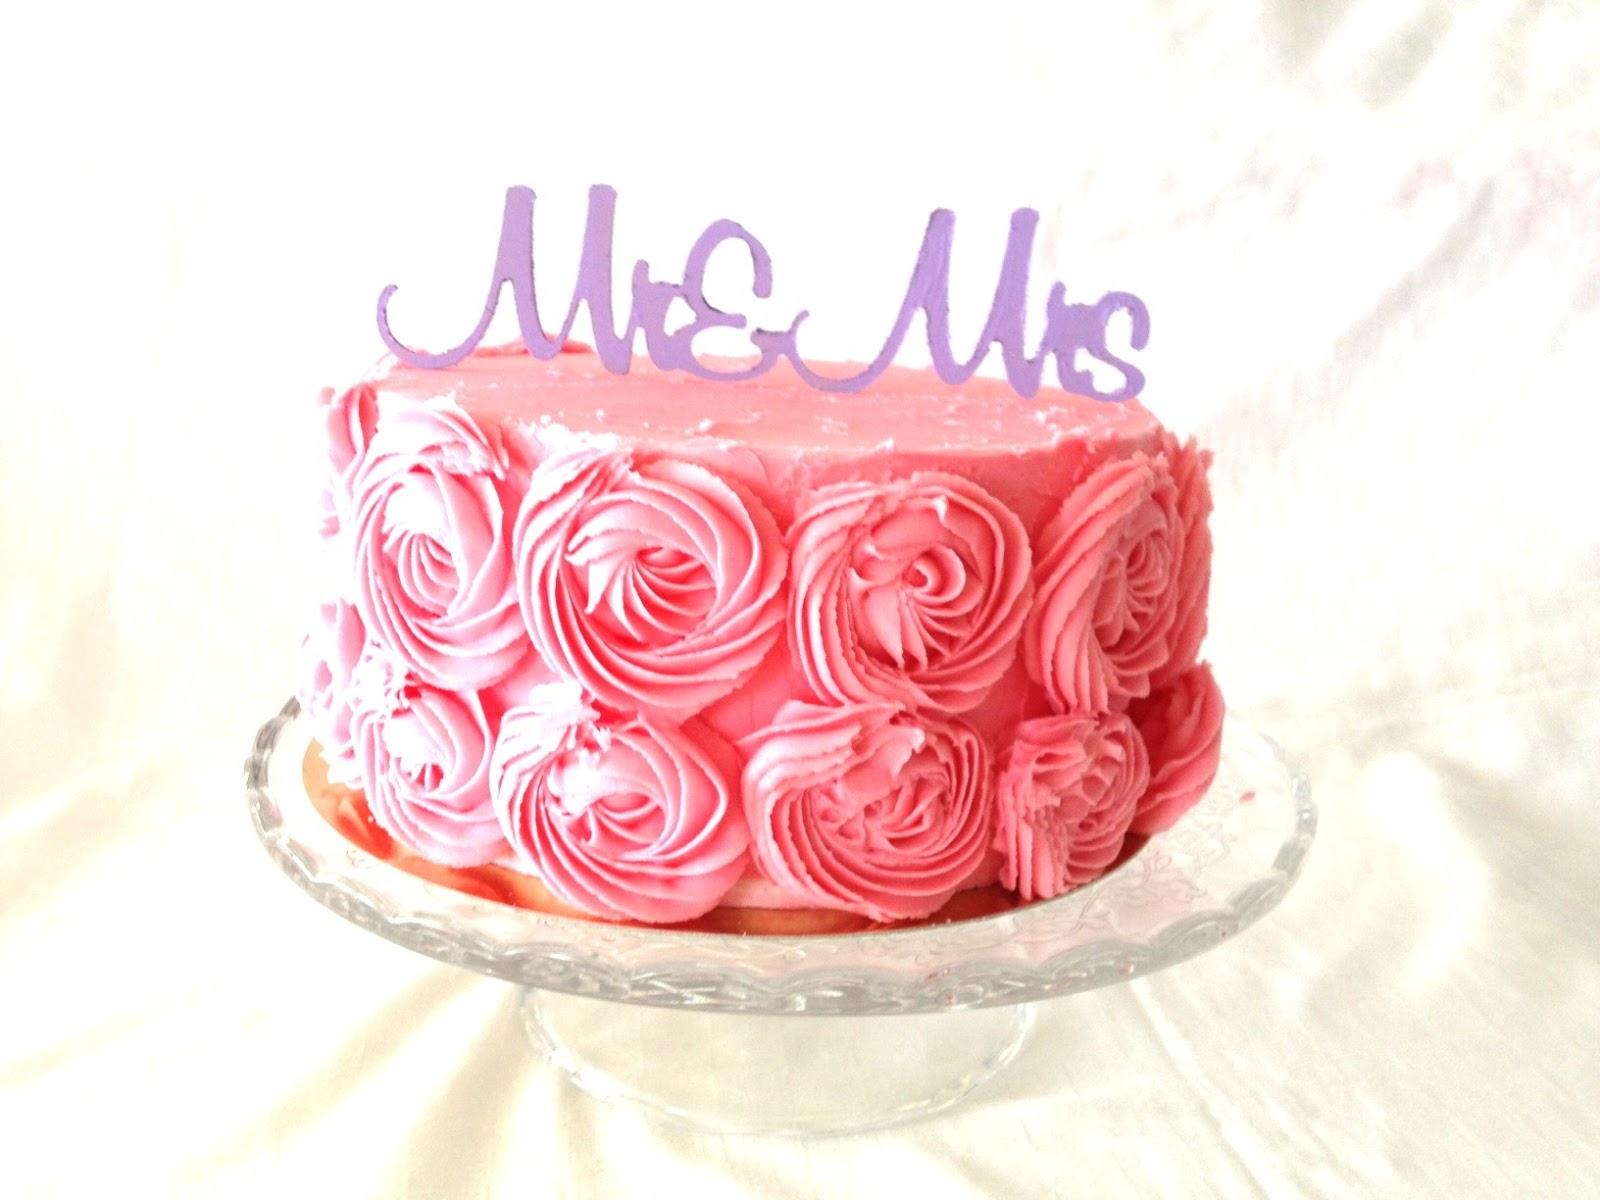 http://le-cose-animate.blogspot.ro/2014/01/mr-si-mrs-cake-topper-torturi-speciale.html